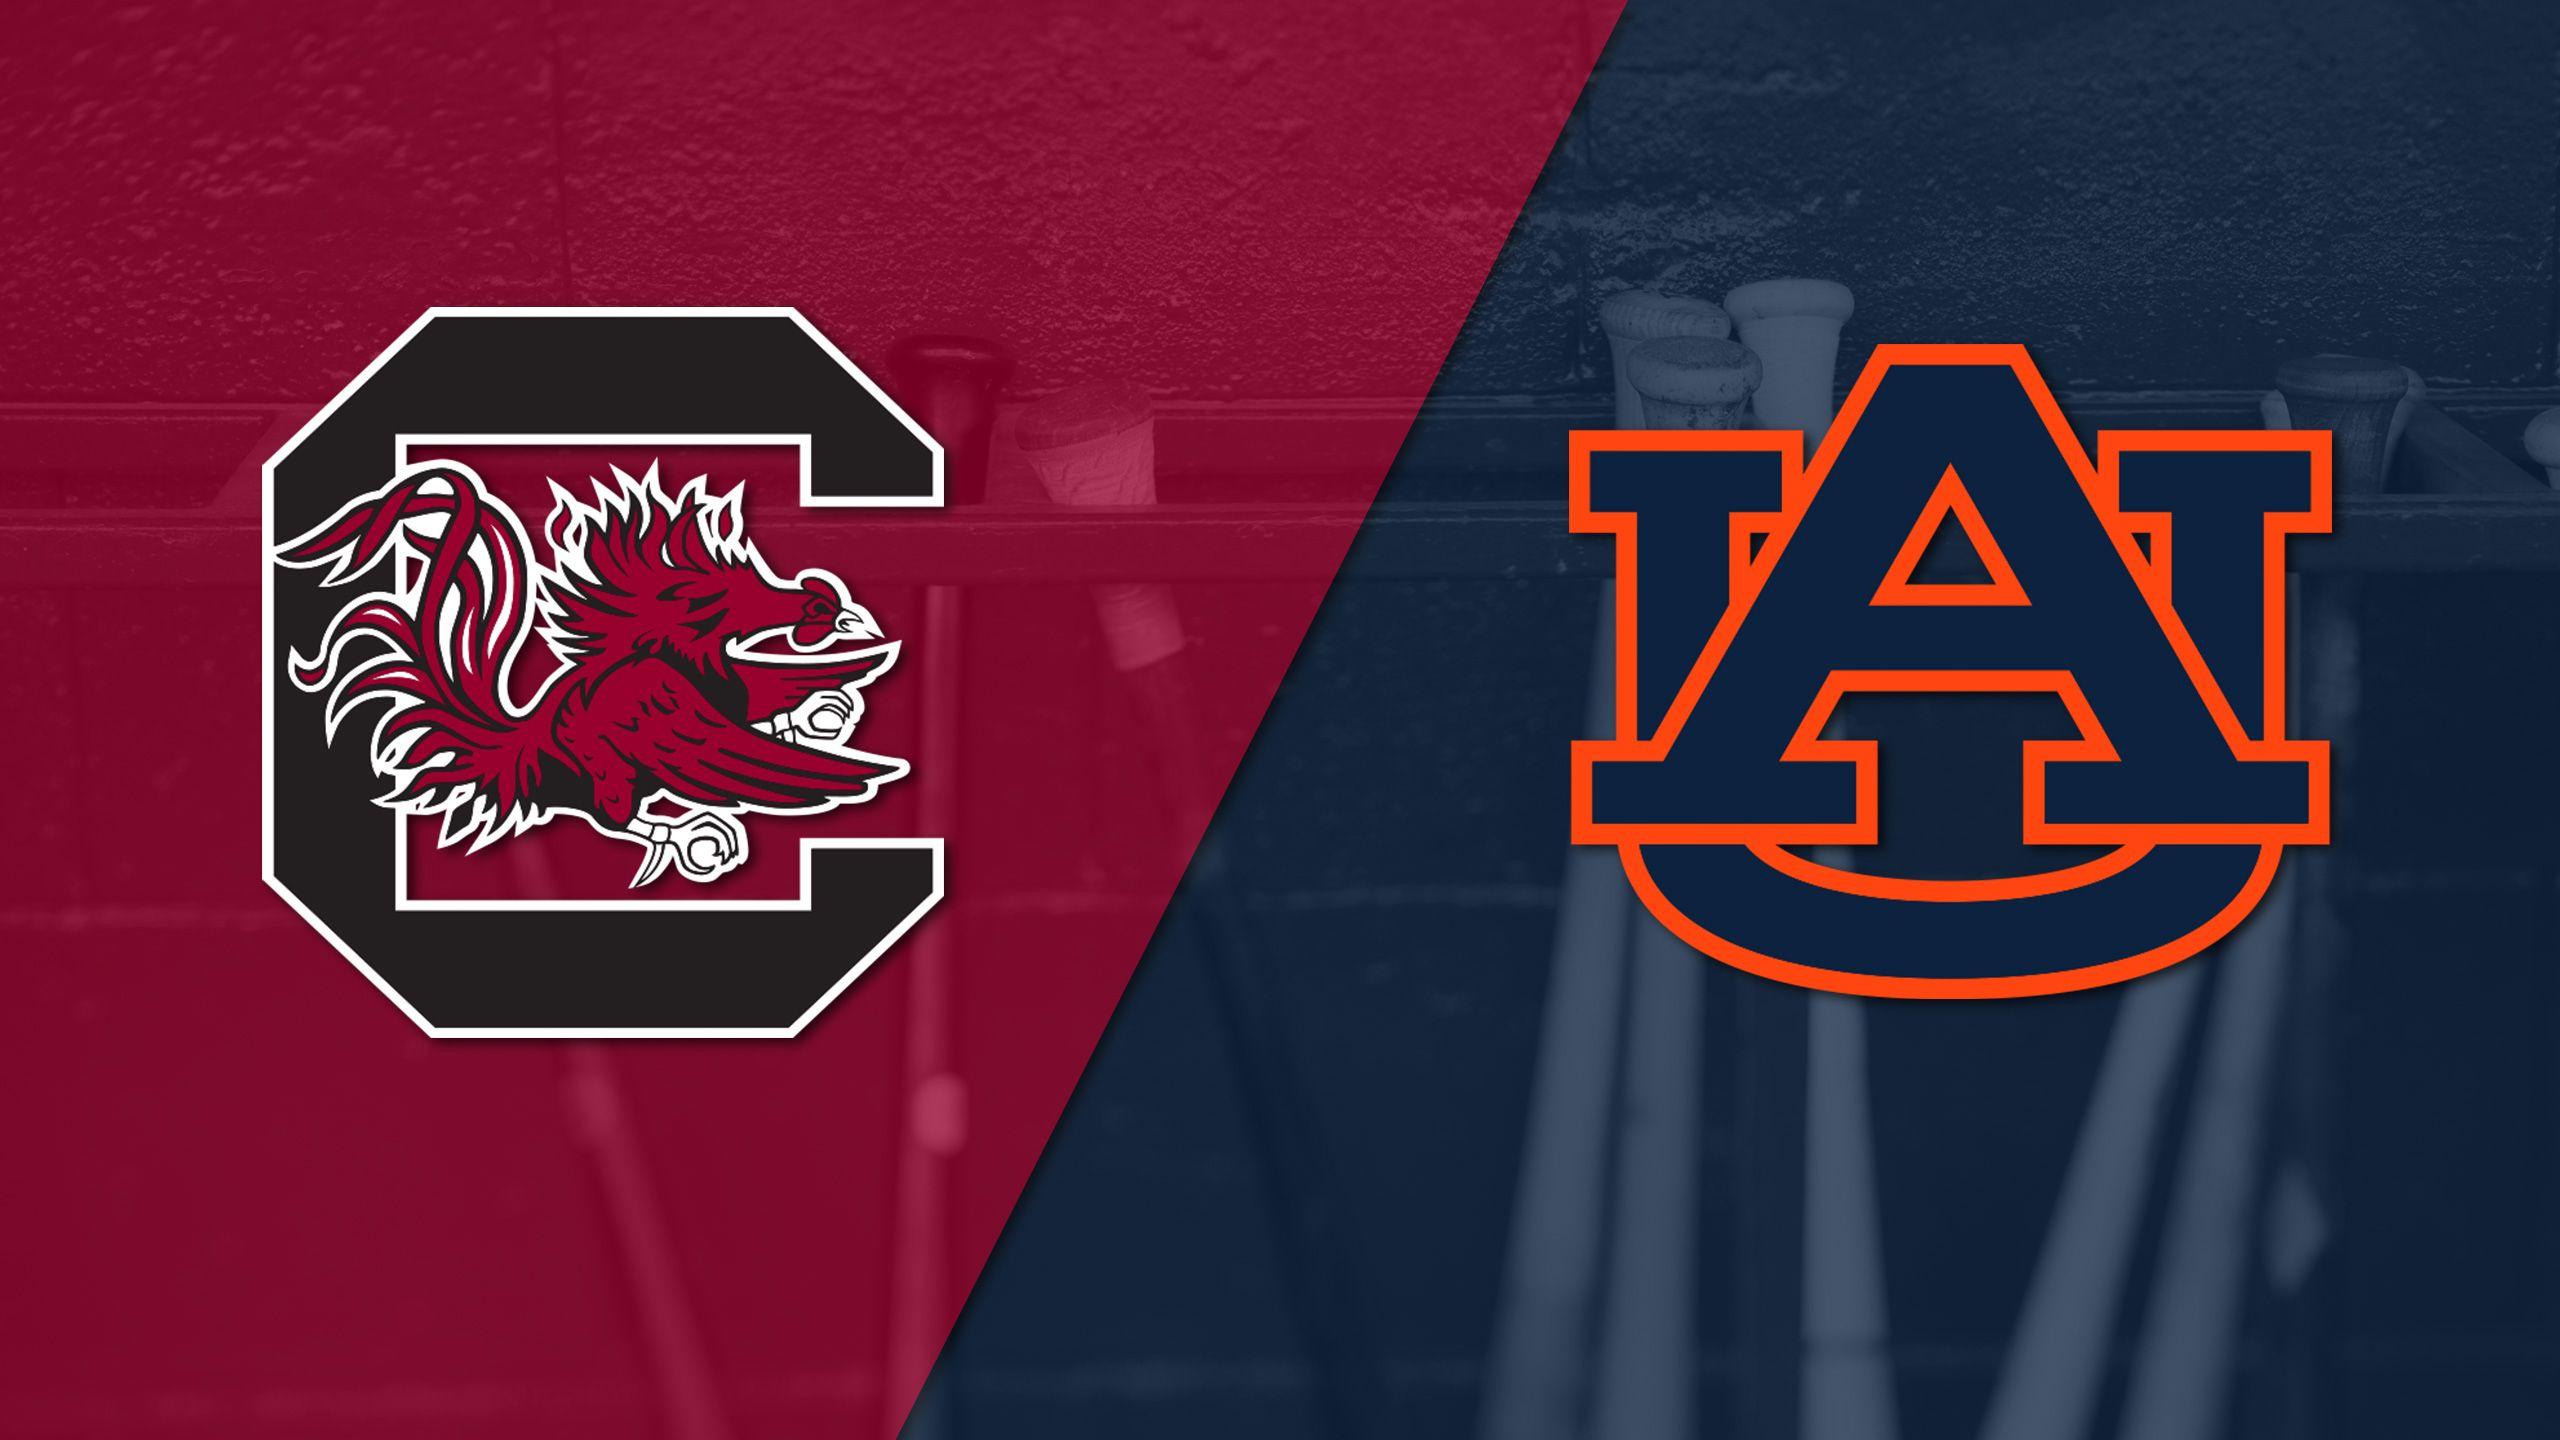 #6 South Carolina vs. #17 Auburn (Baseball)